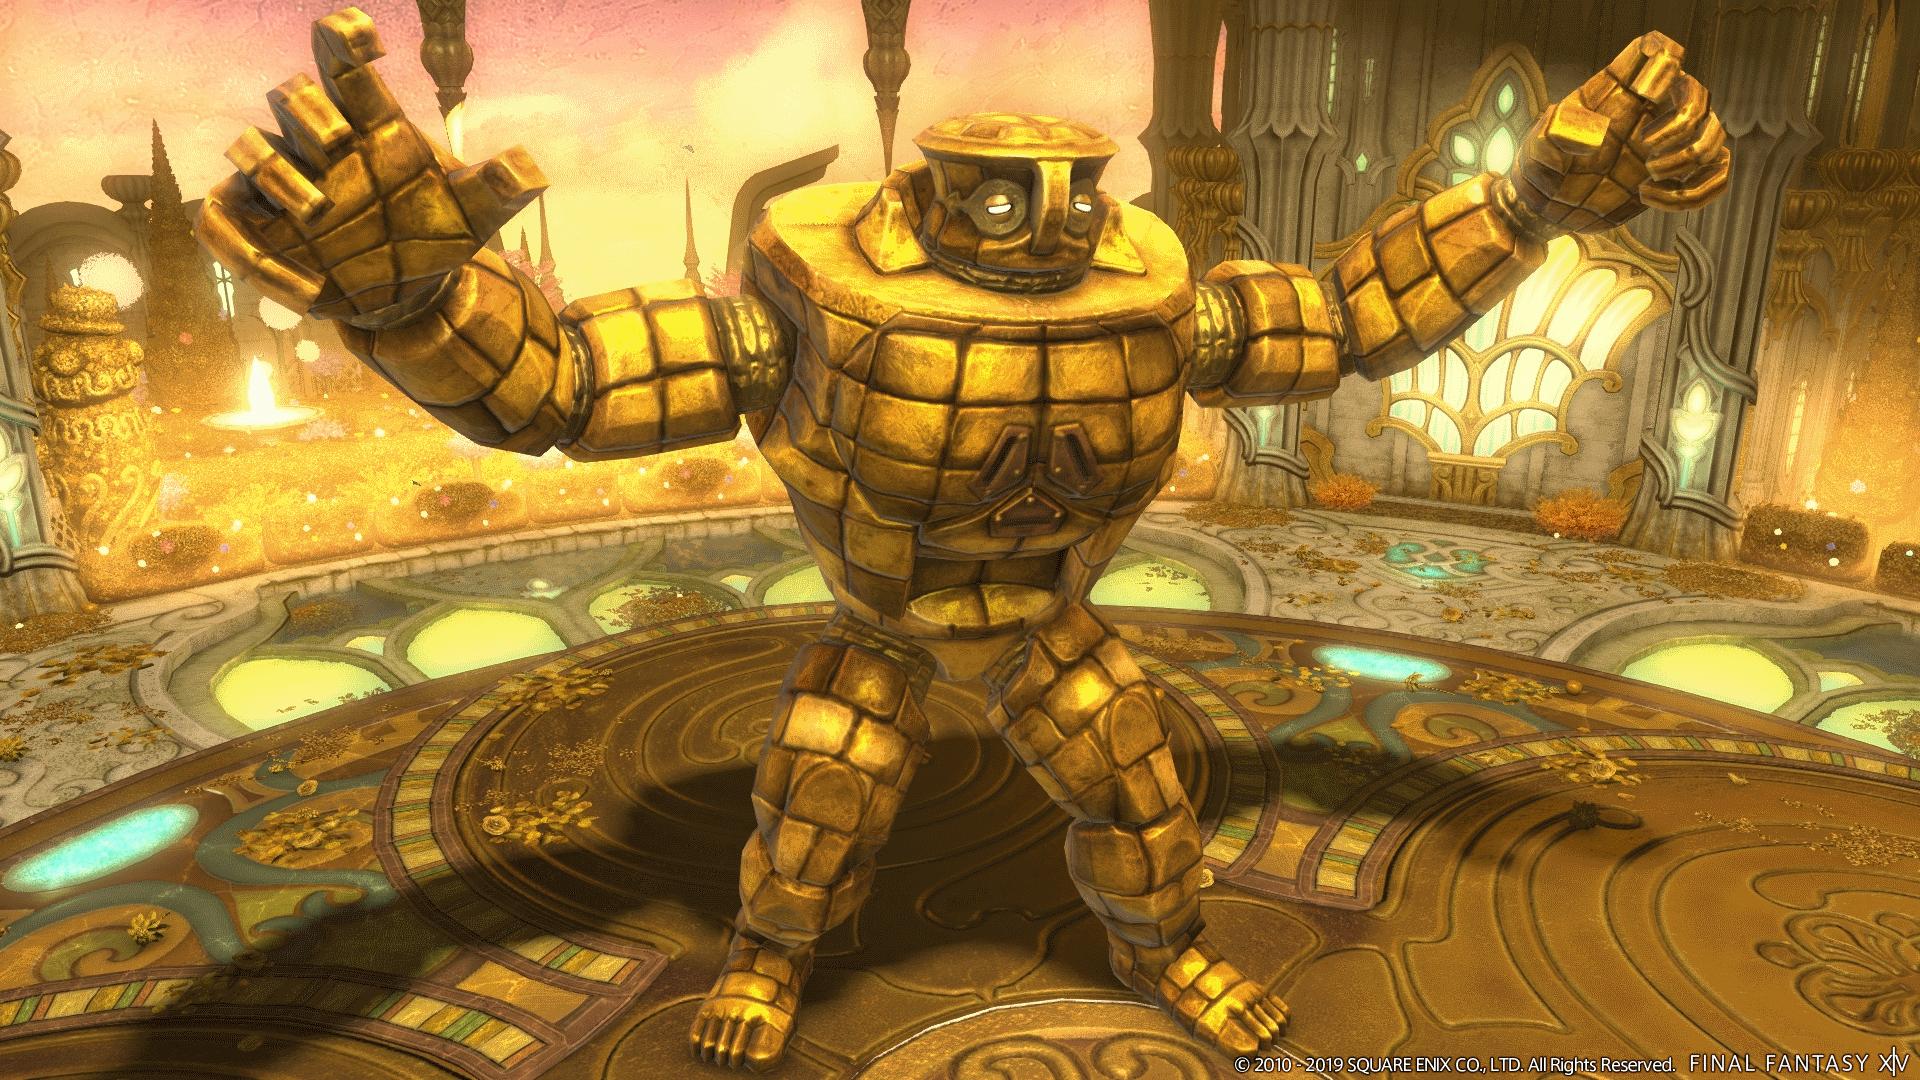 Final Fantasy XIV: Shadowbringers Patch 5.05 Now Live